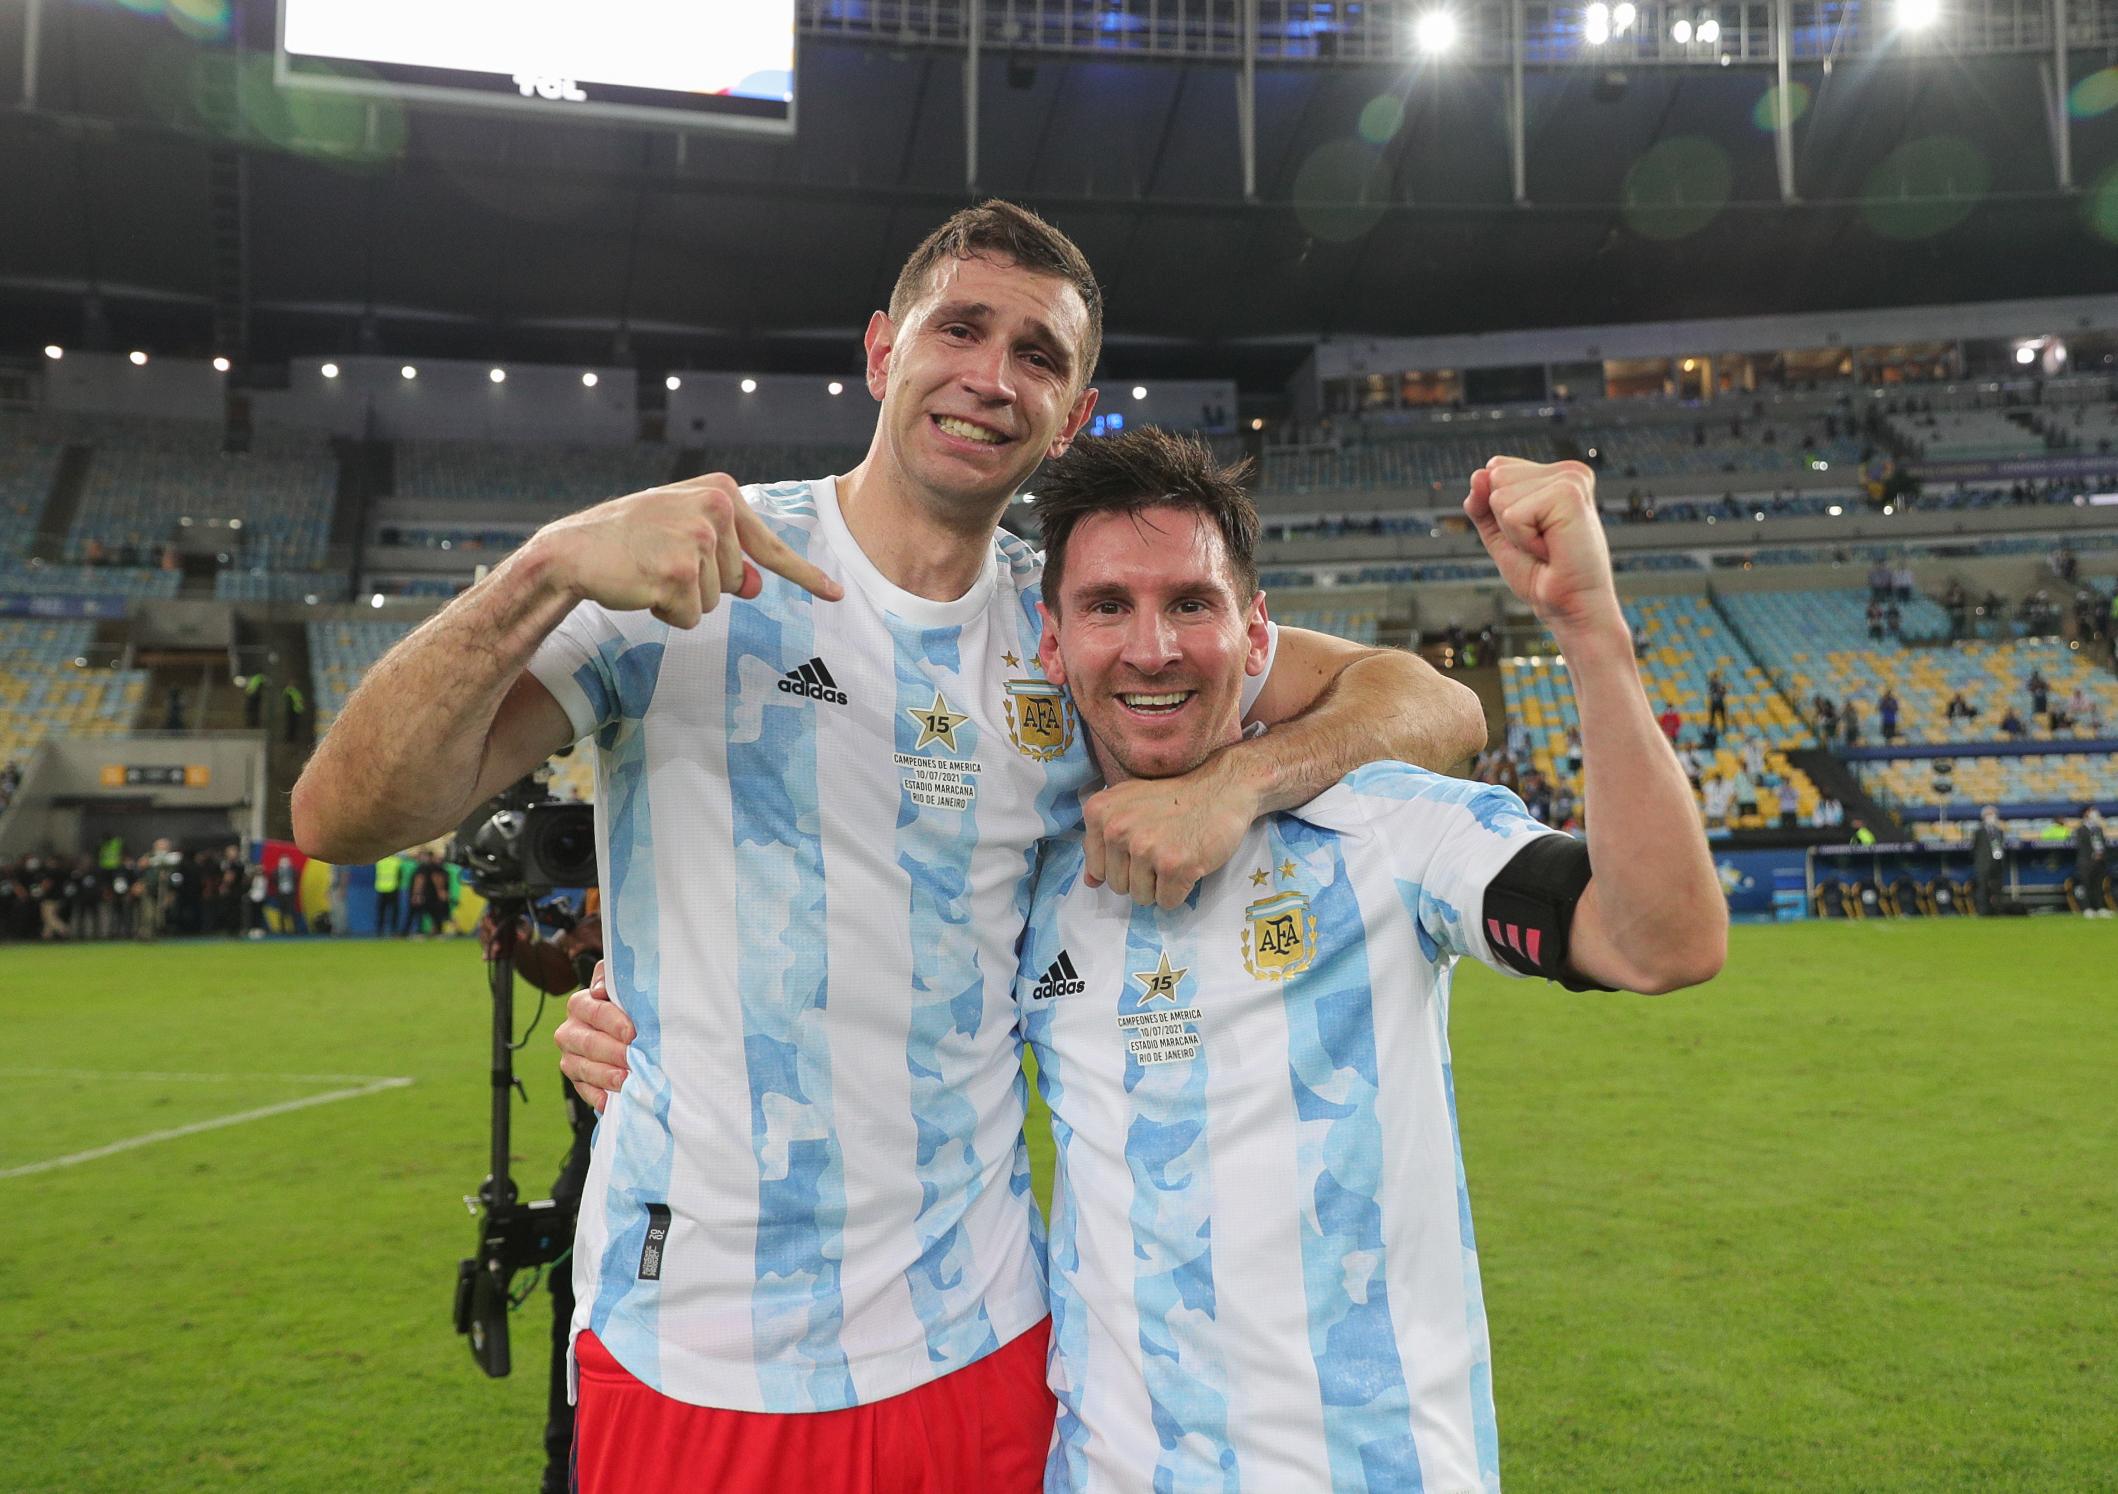 Vamos, vamos, Argentina. Esa Copa linda y deseada - Página 13 E5_F0p6XIAEY-Mp?format=jpg&name=4096x4096